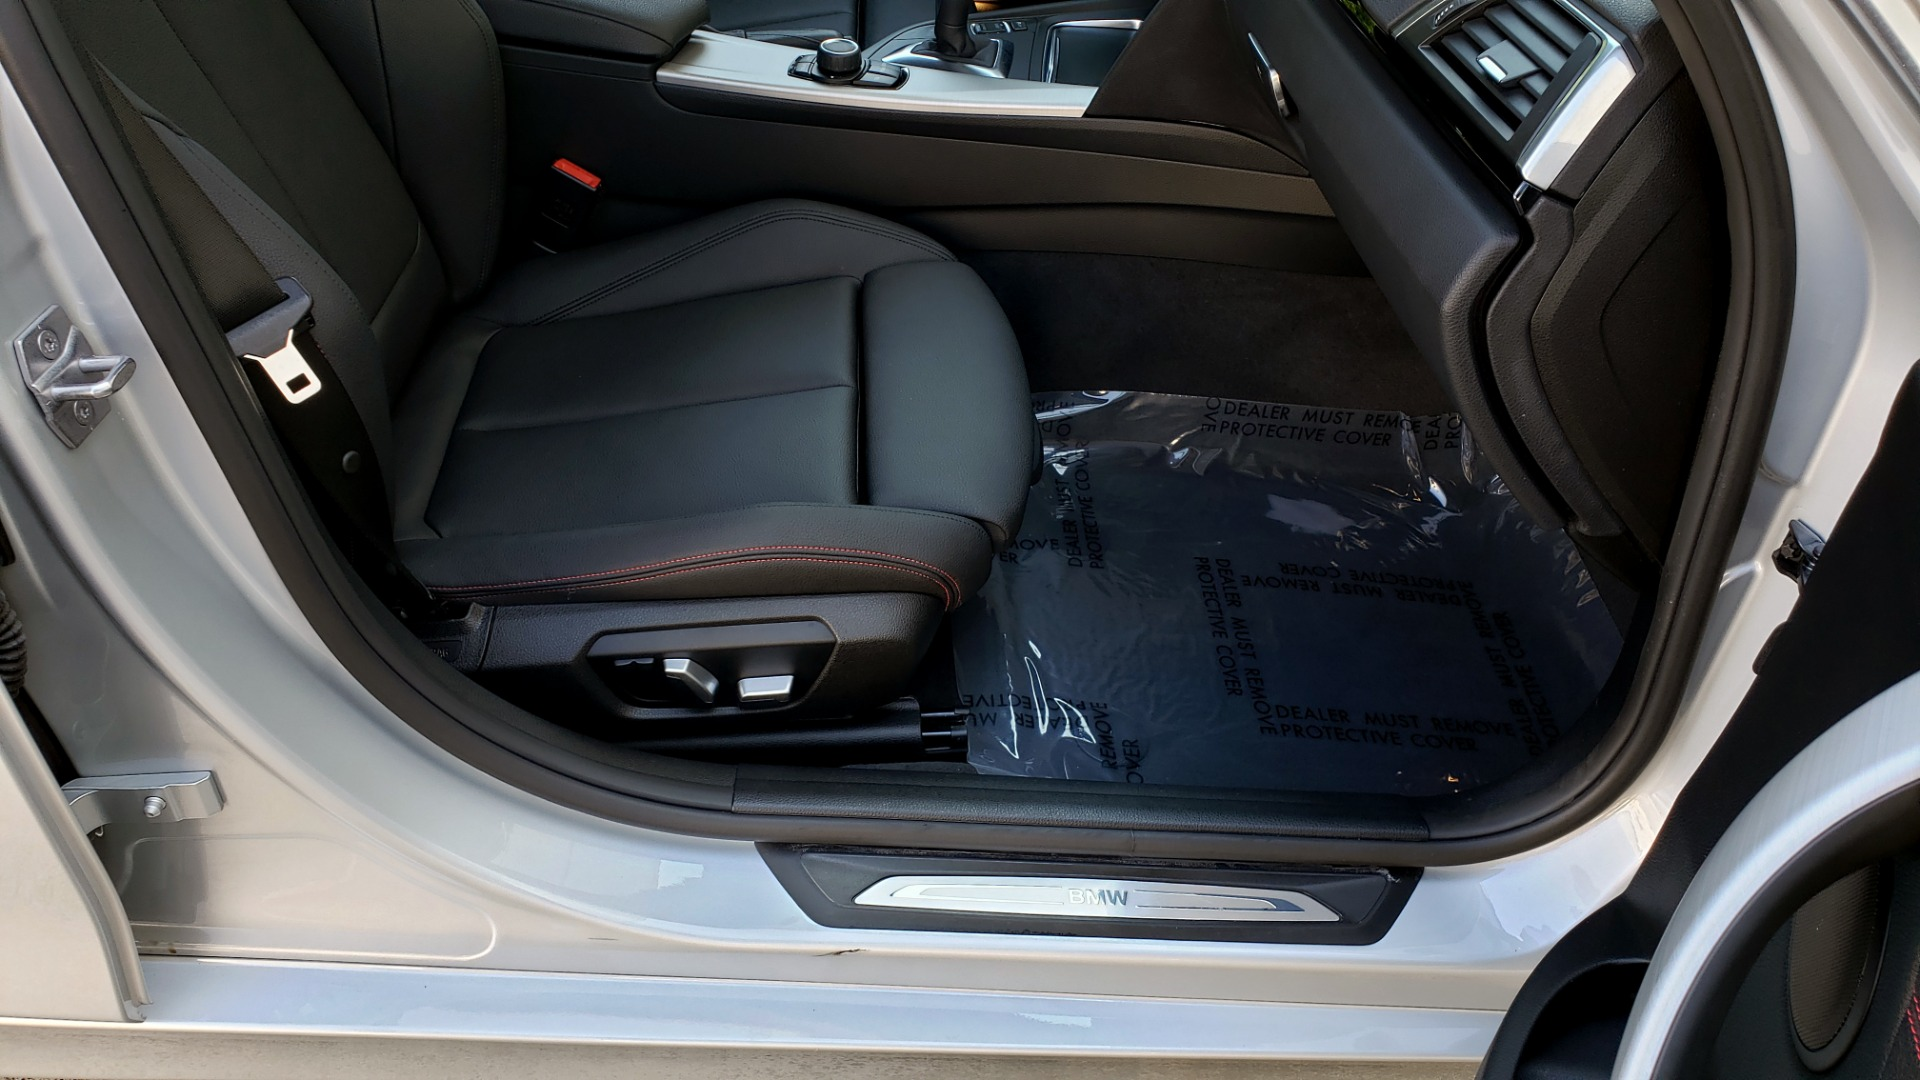 Used 2017 BMW 3 SERIES 330I SPORT SEDAN / DRVR ASST PKG / SUNROOF / REARVIEW for sale Sold at Formula Imports in Charlotte NC 28227 65